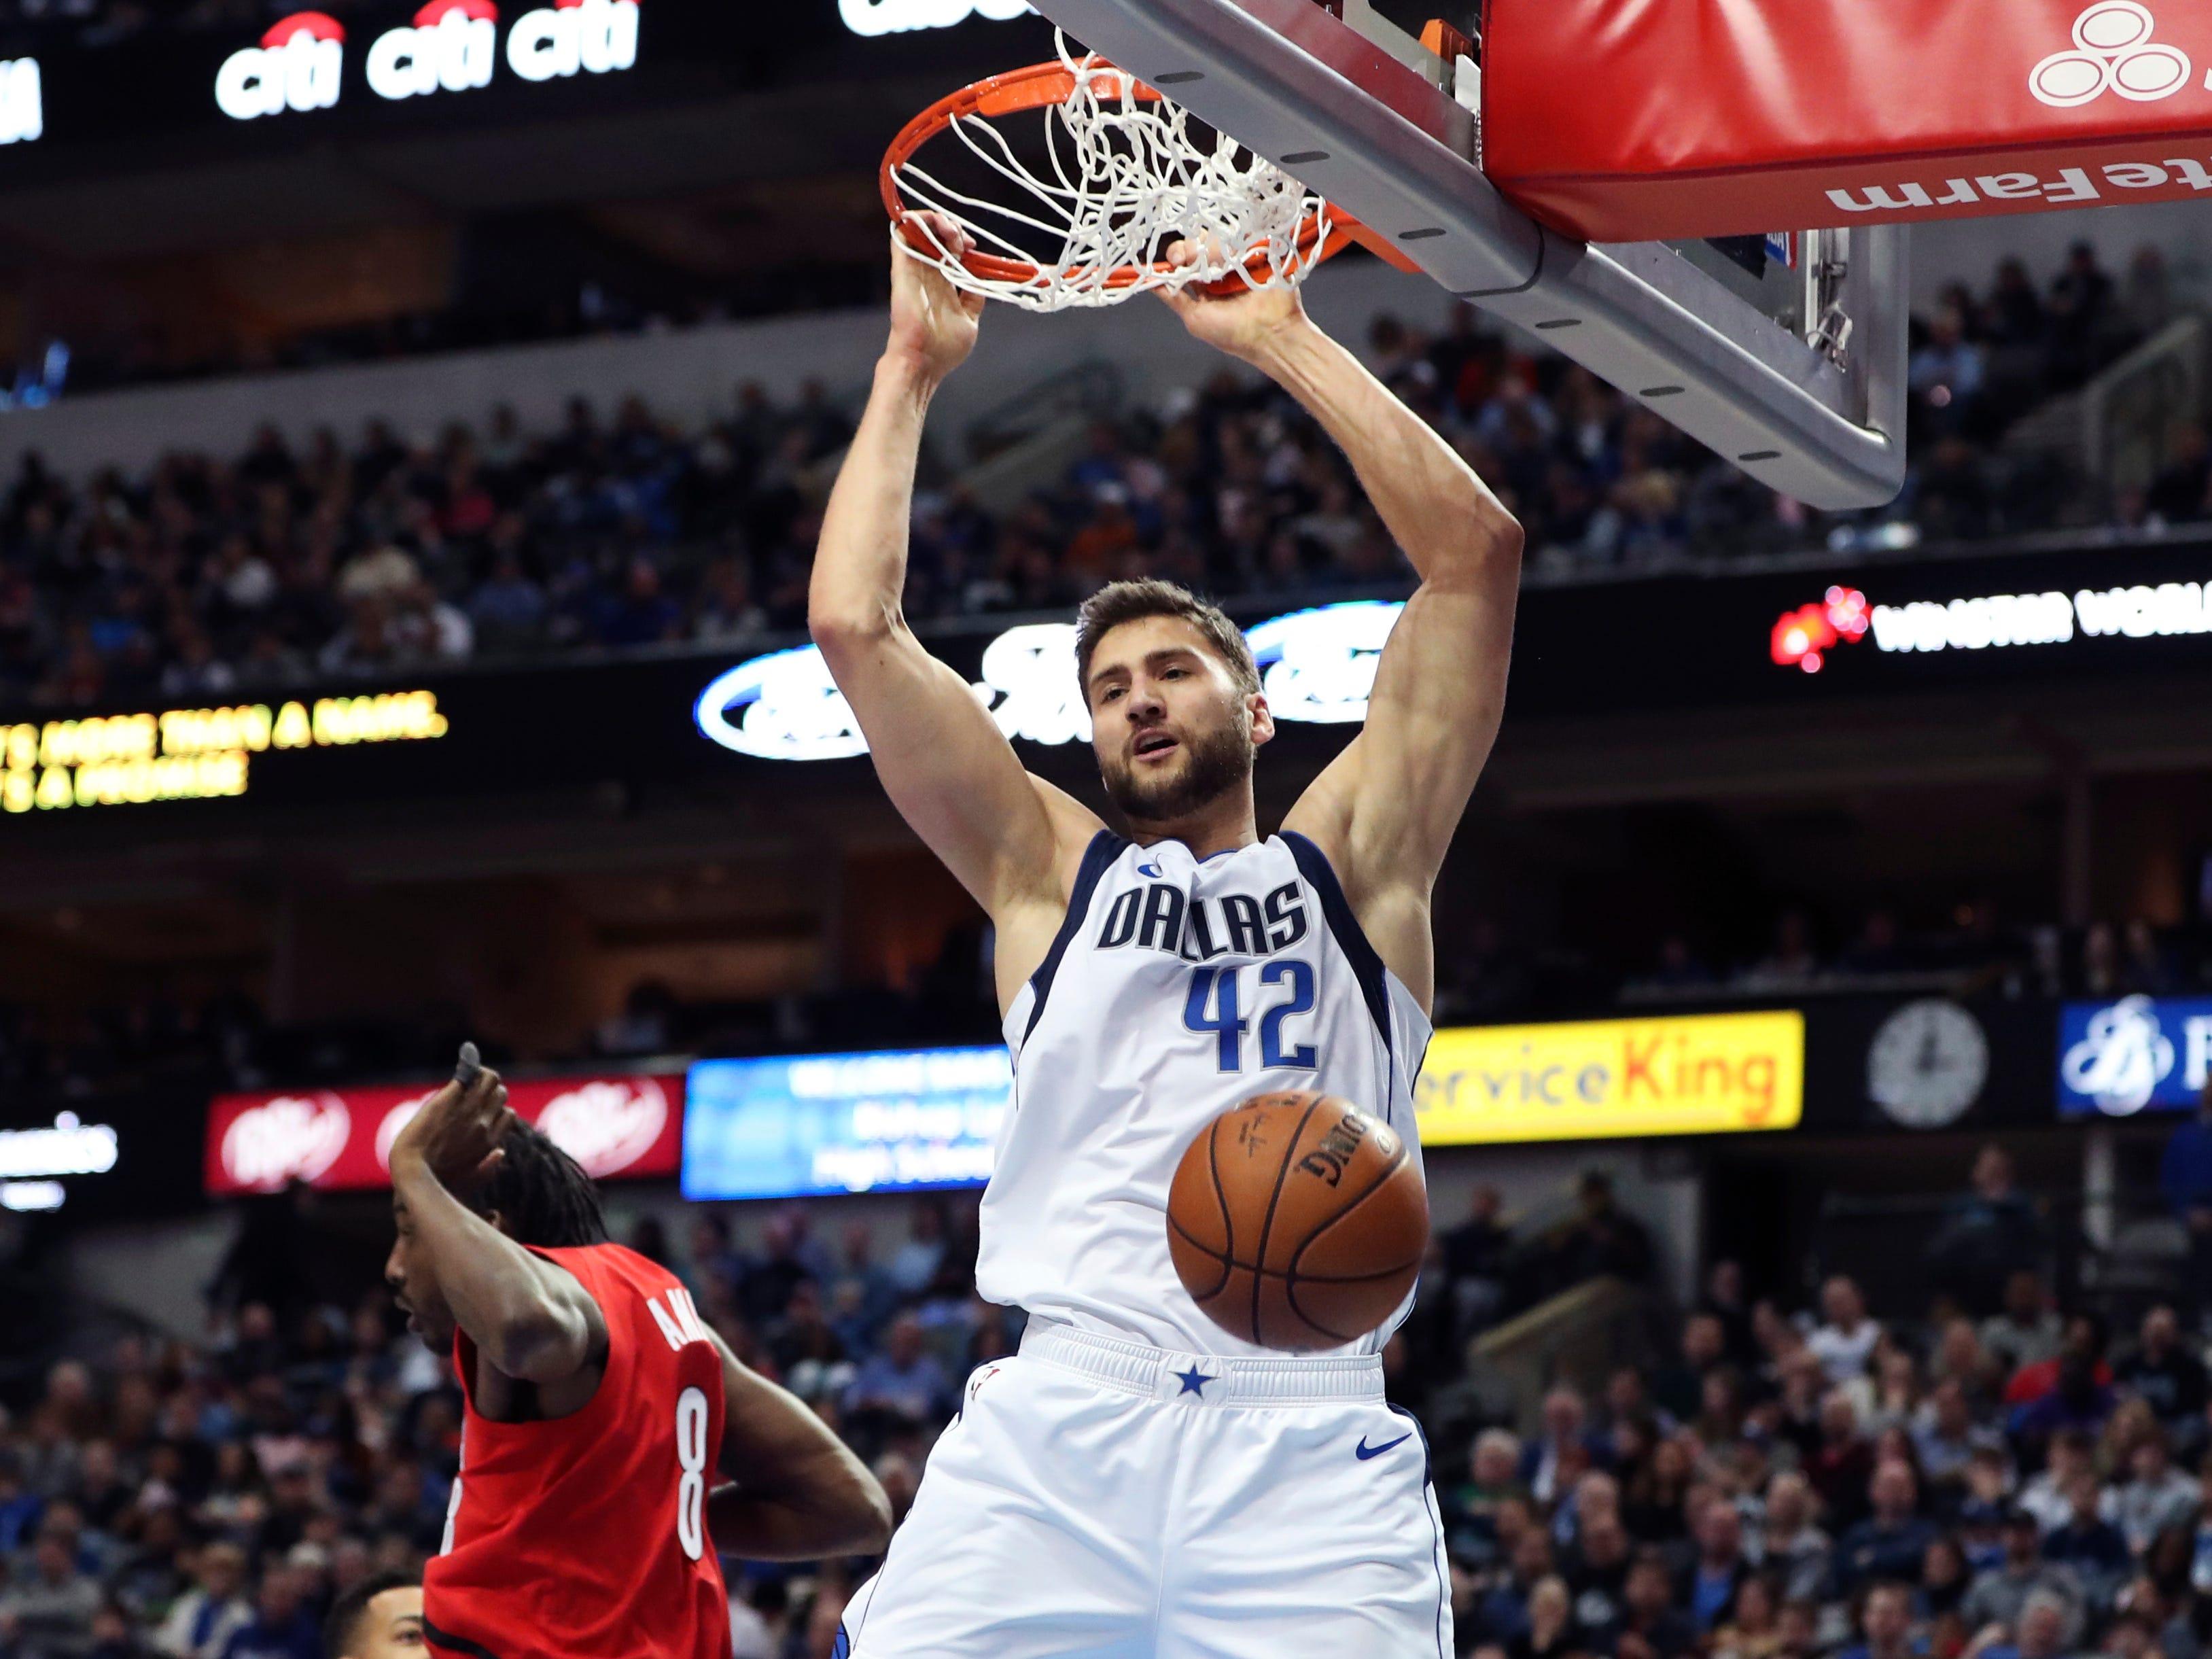 Feb 10: Dallas Mavericks forward Maximilian Kleber (42) dunks slams one home against the Portland Trail Blazers.